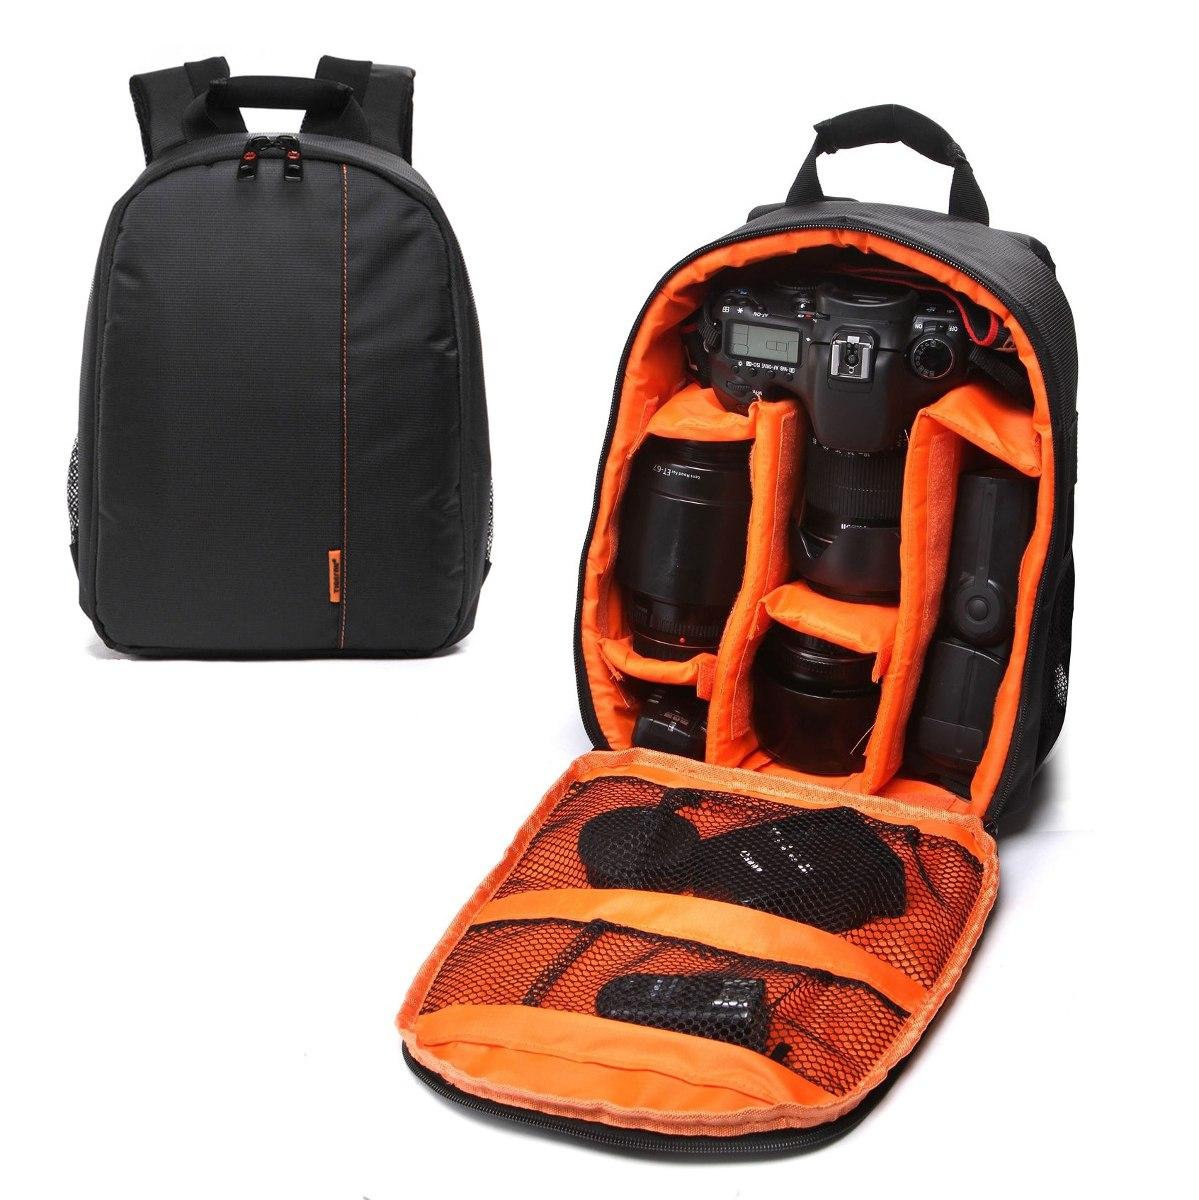 b67a17355623e mochila fotográfica para cámara réflex lentes flash naranja. Cargando zoom.